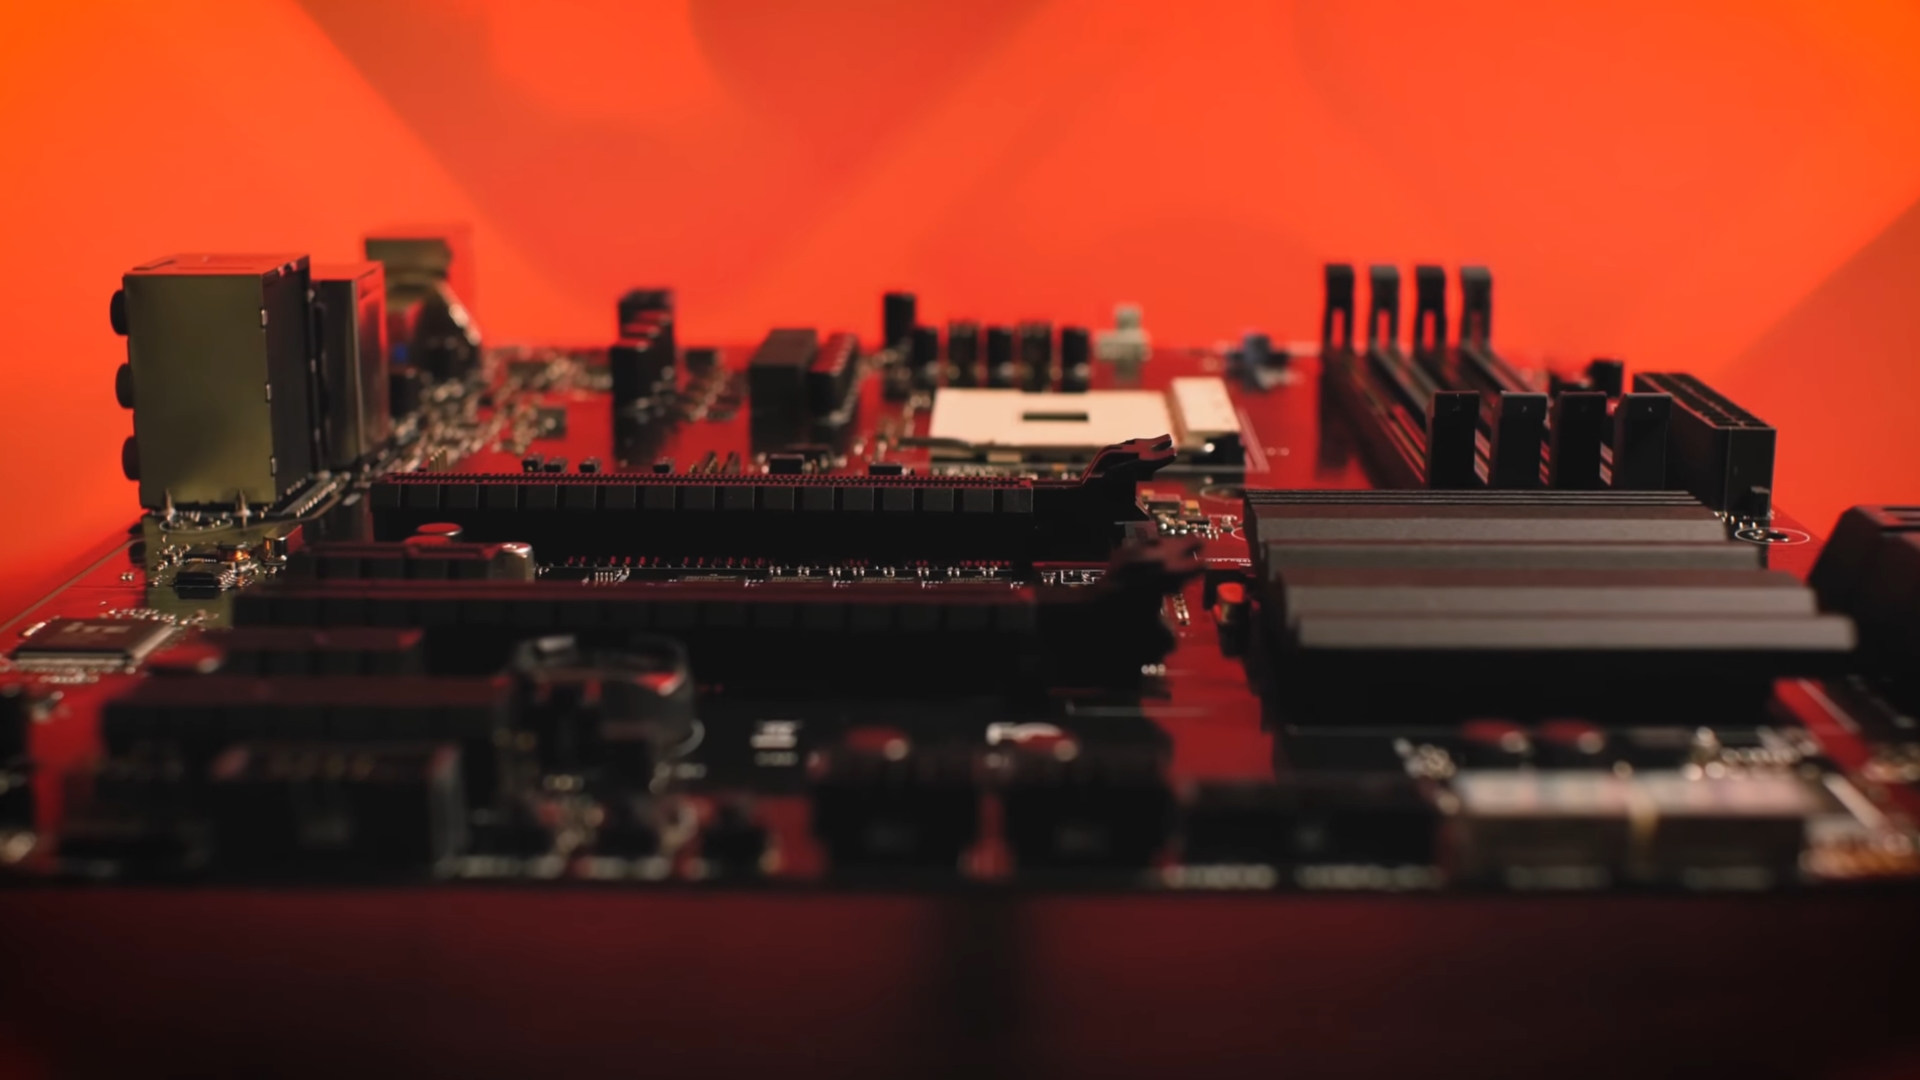 Best AMD gaming motherboard